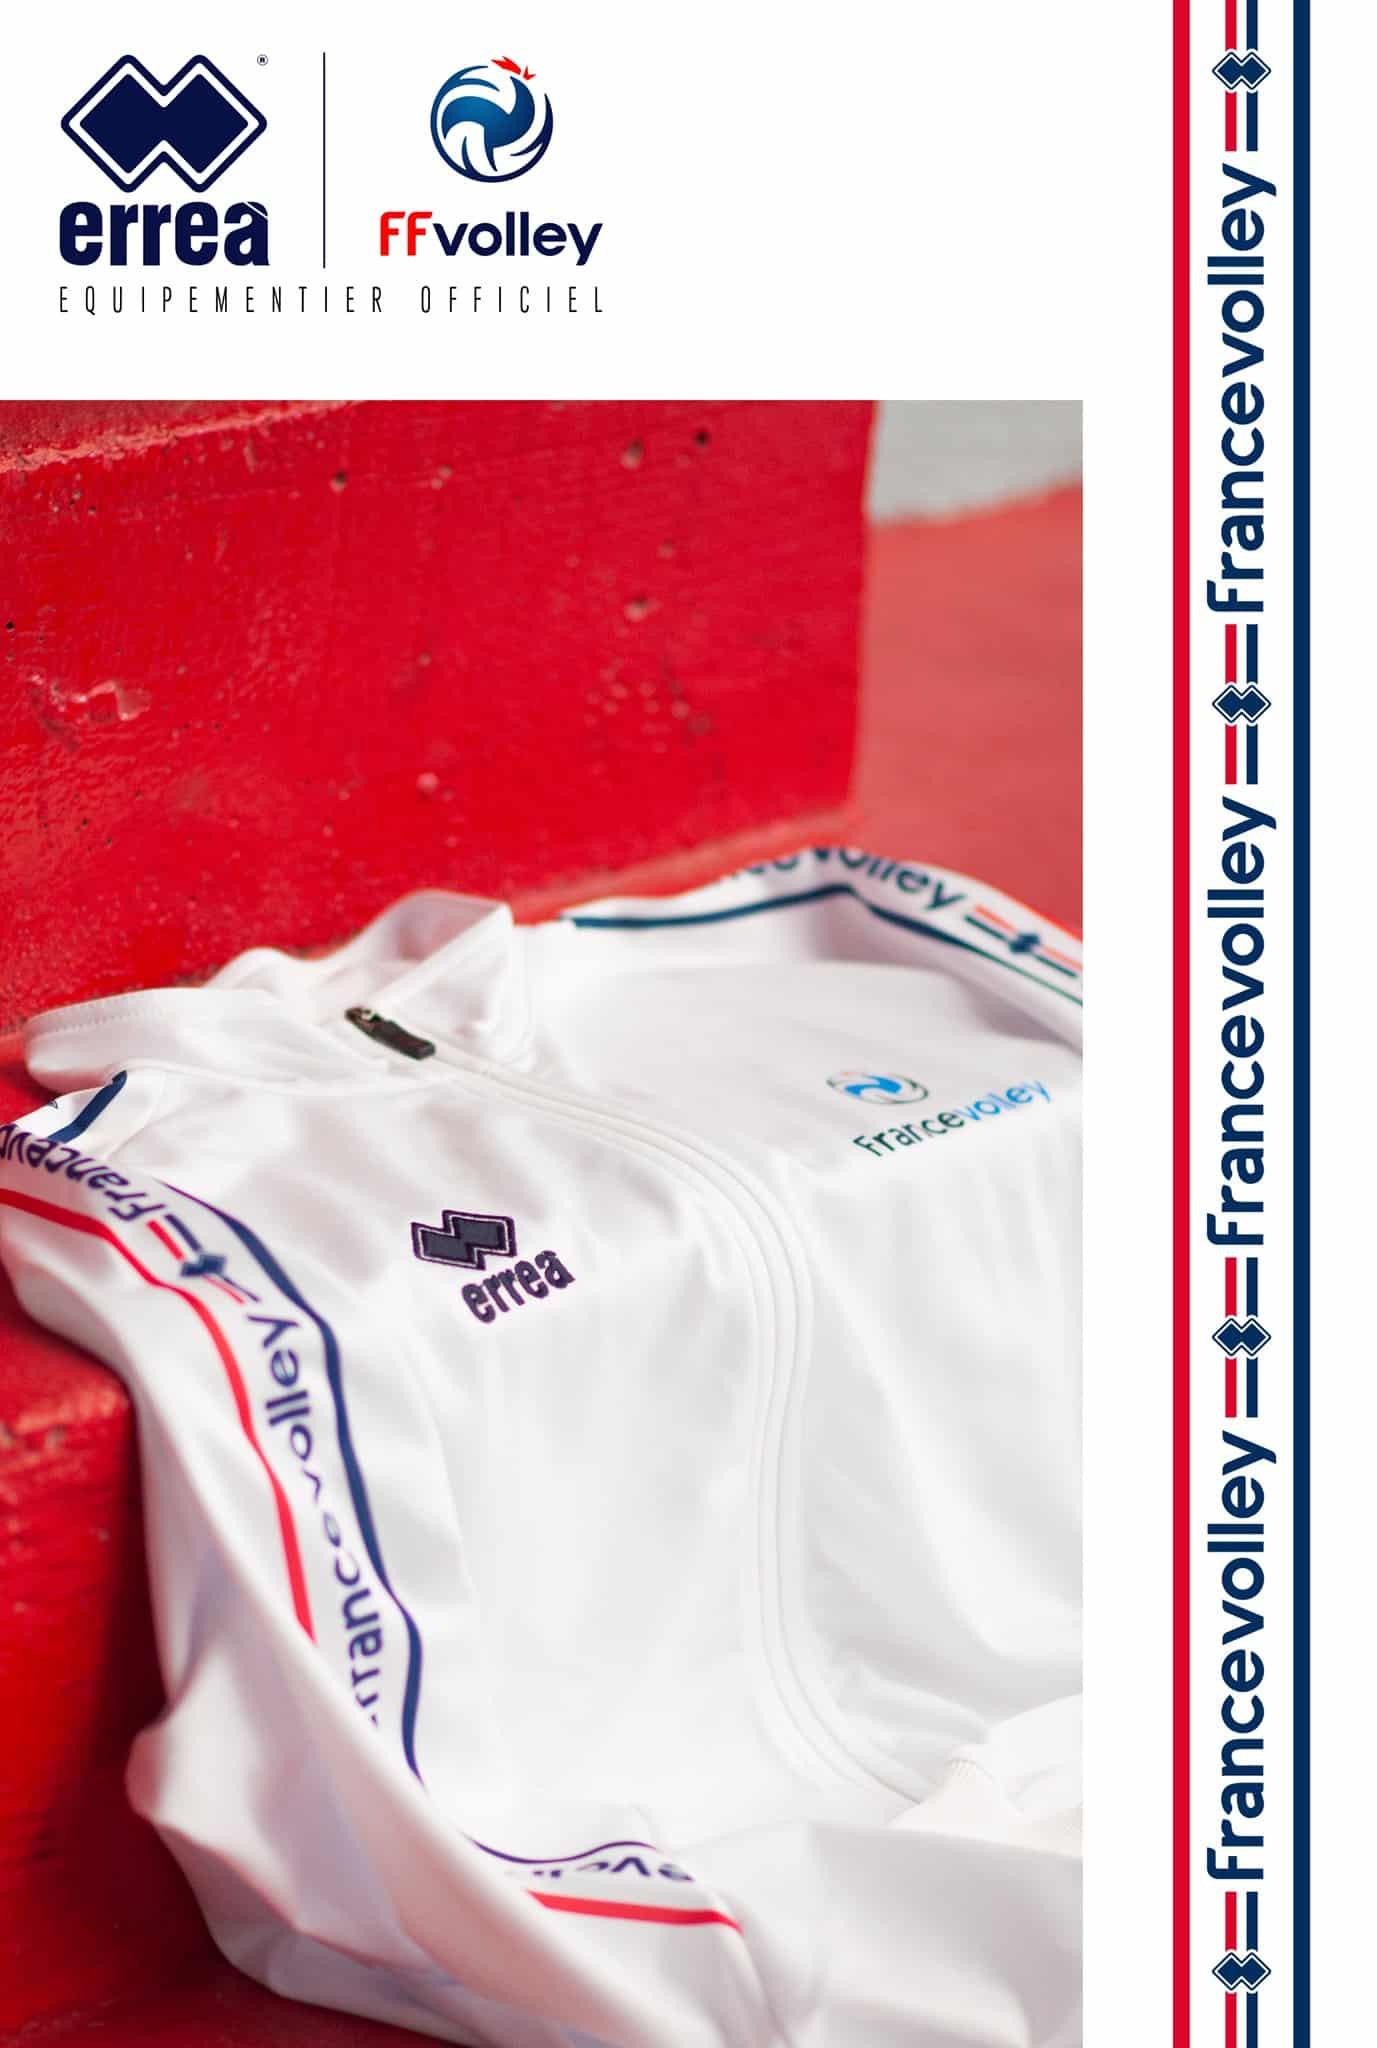 un-nouveau-maillot-errea-de-lequipe-de-france-de-volley-a-venir-7